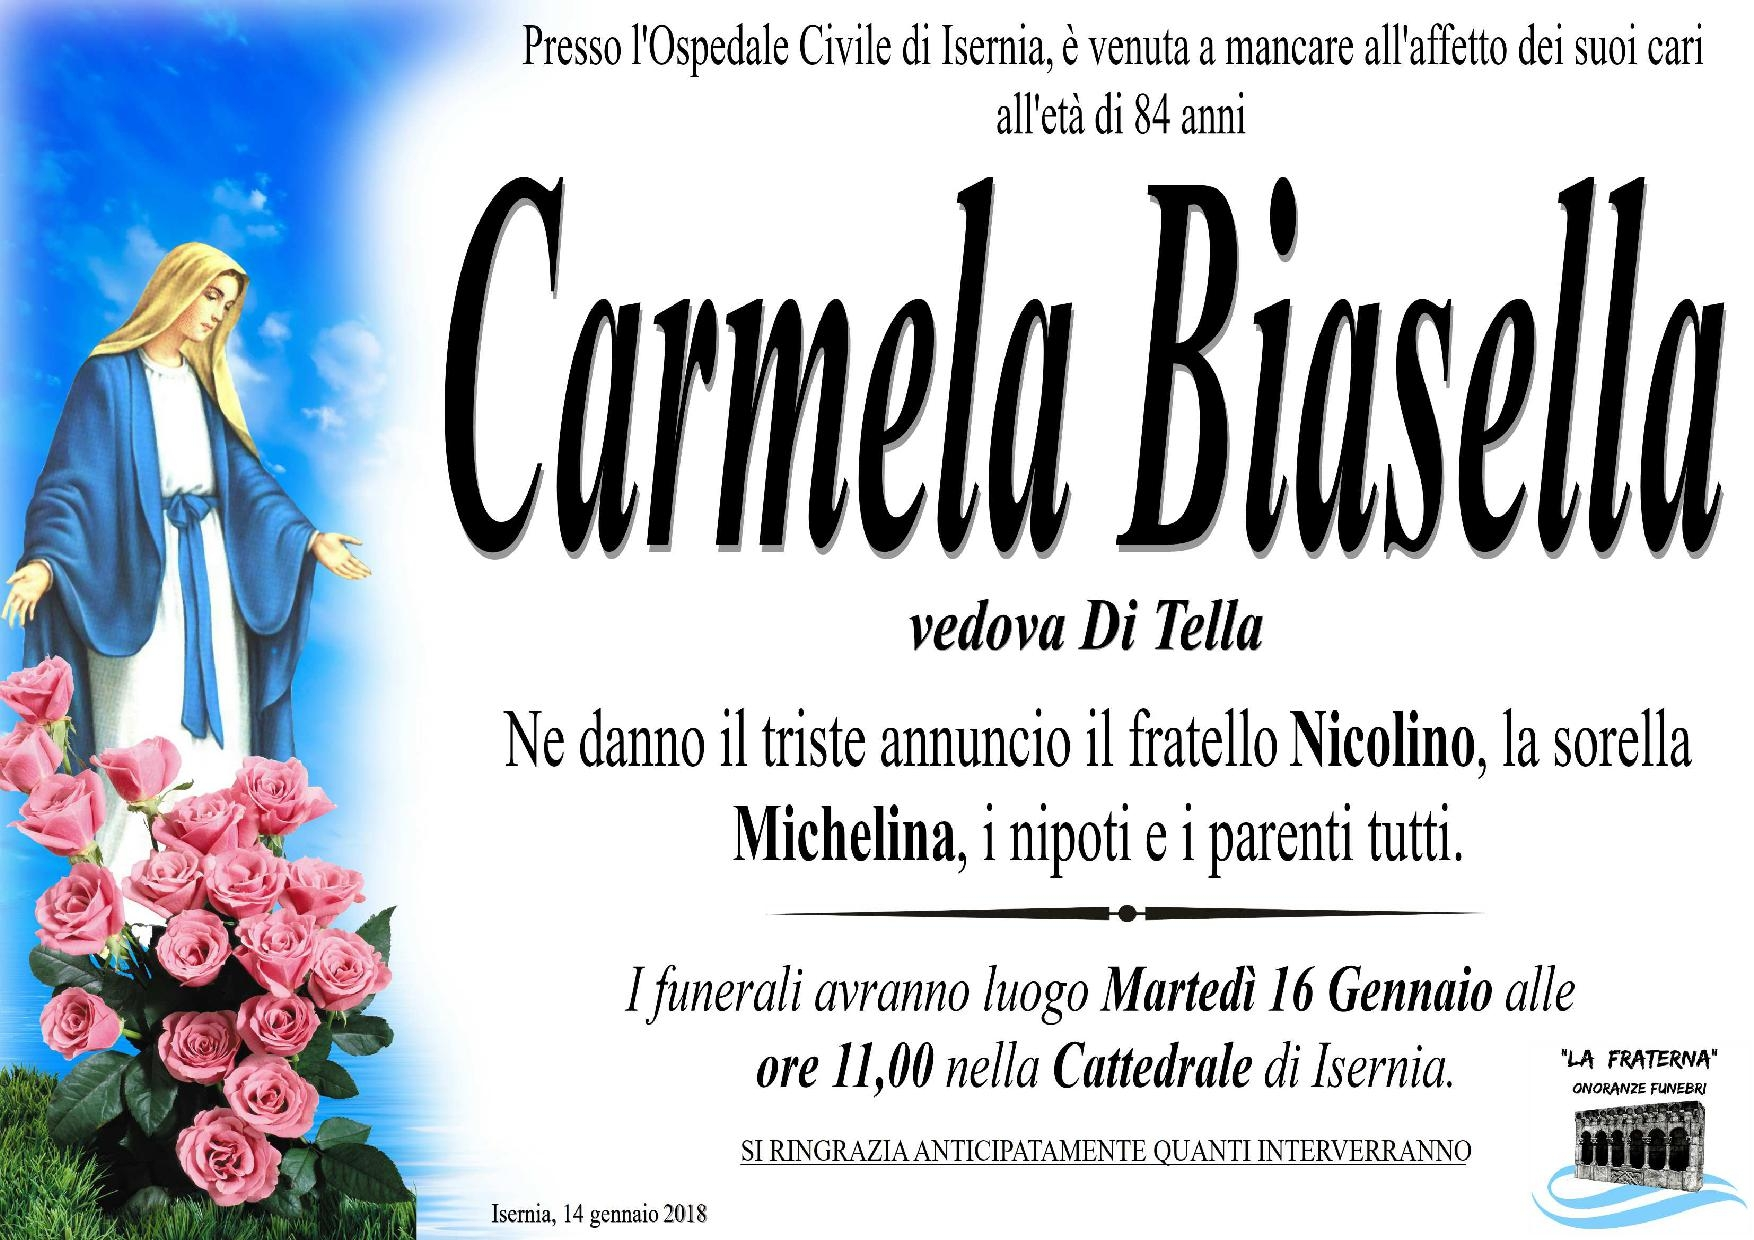 Carmela Biasella, 14/01/2018, Isernia – Onoranze Funebri La Fraterna